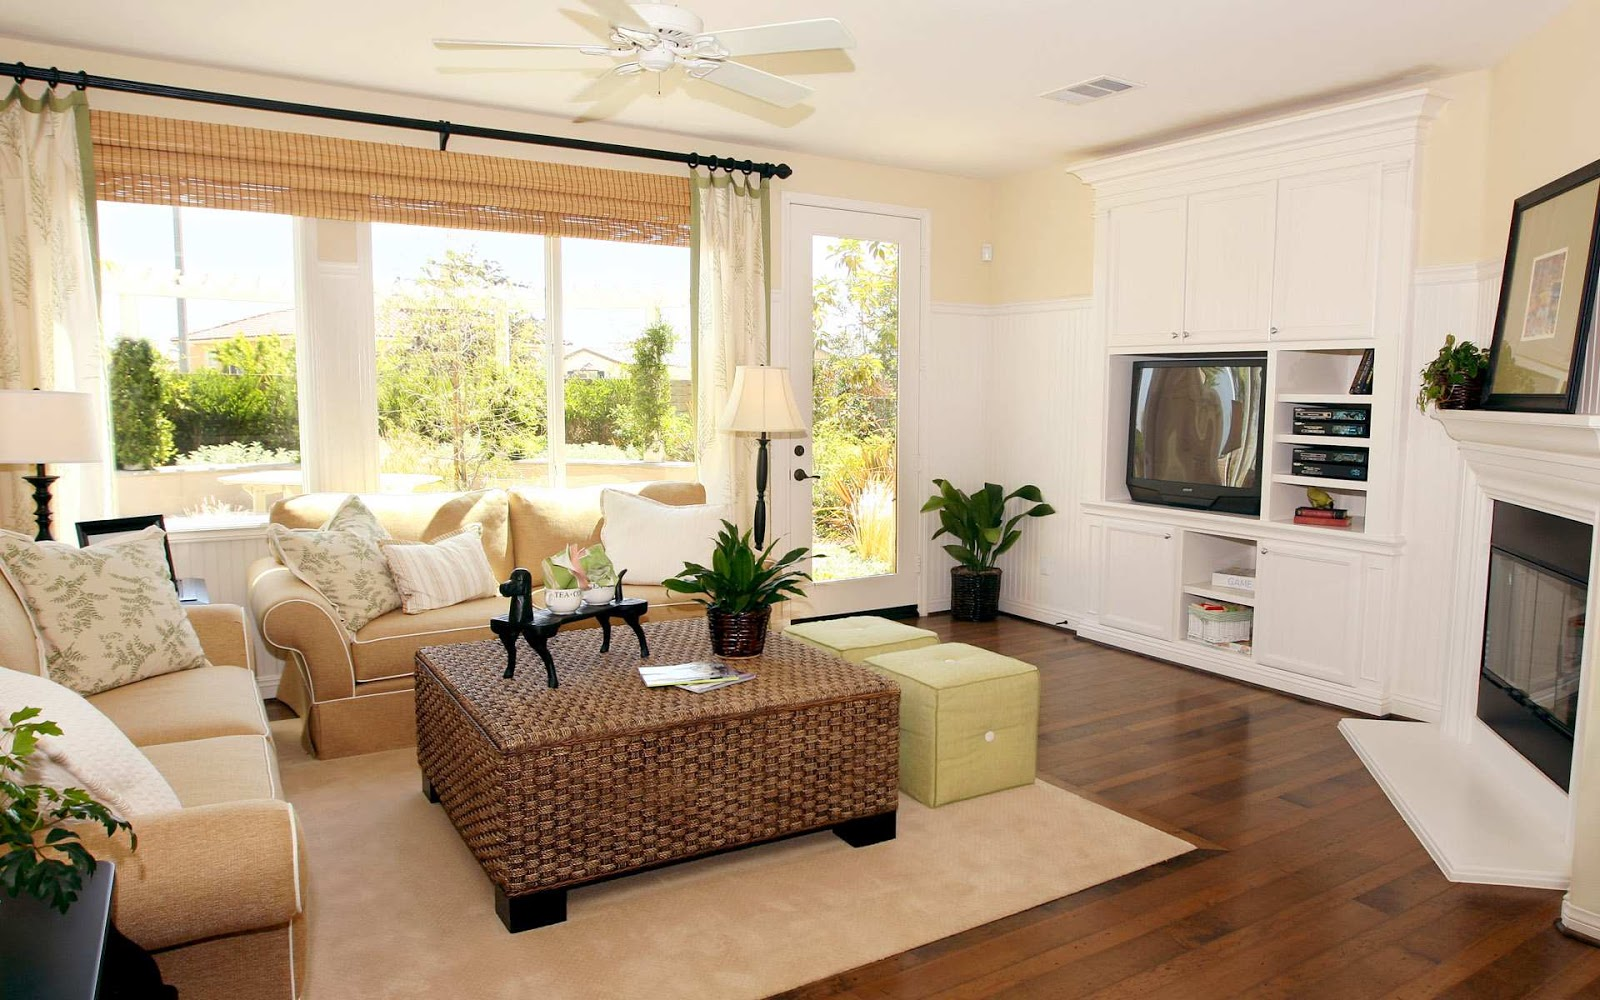 Interior Design: Interior Design Ideas For Hall. Living Hall Interior Design Ideas Backgrounds For Hall App Androids Hd Pics